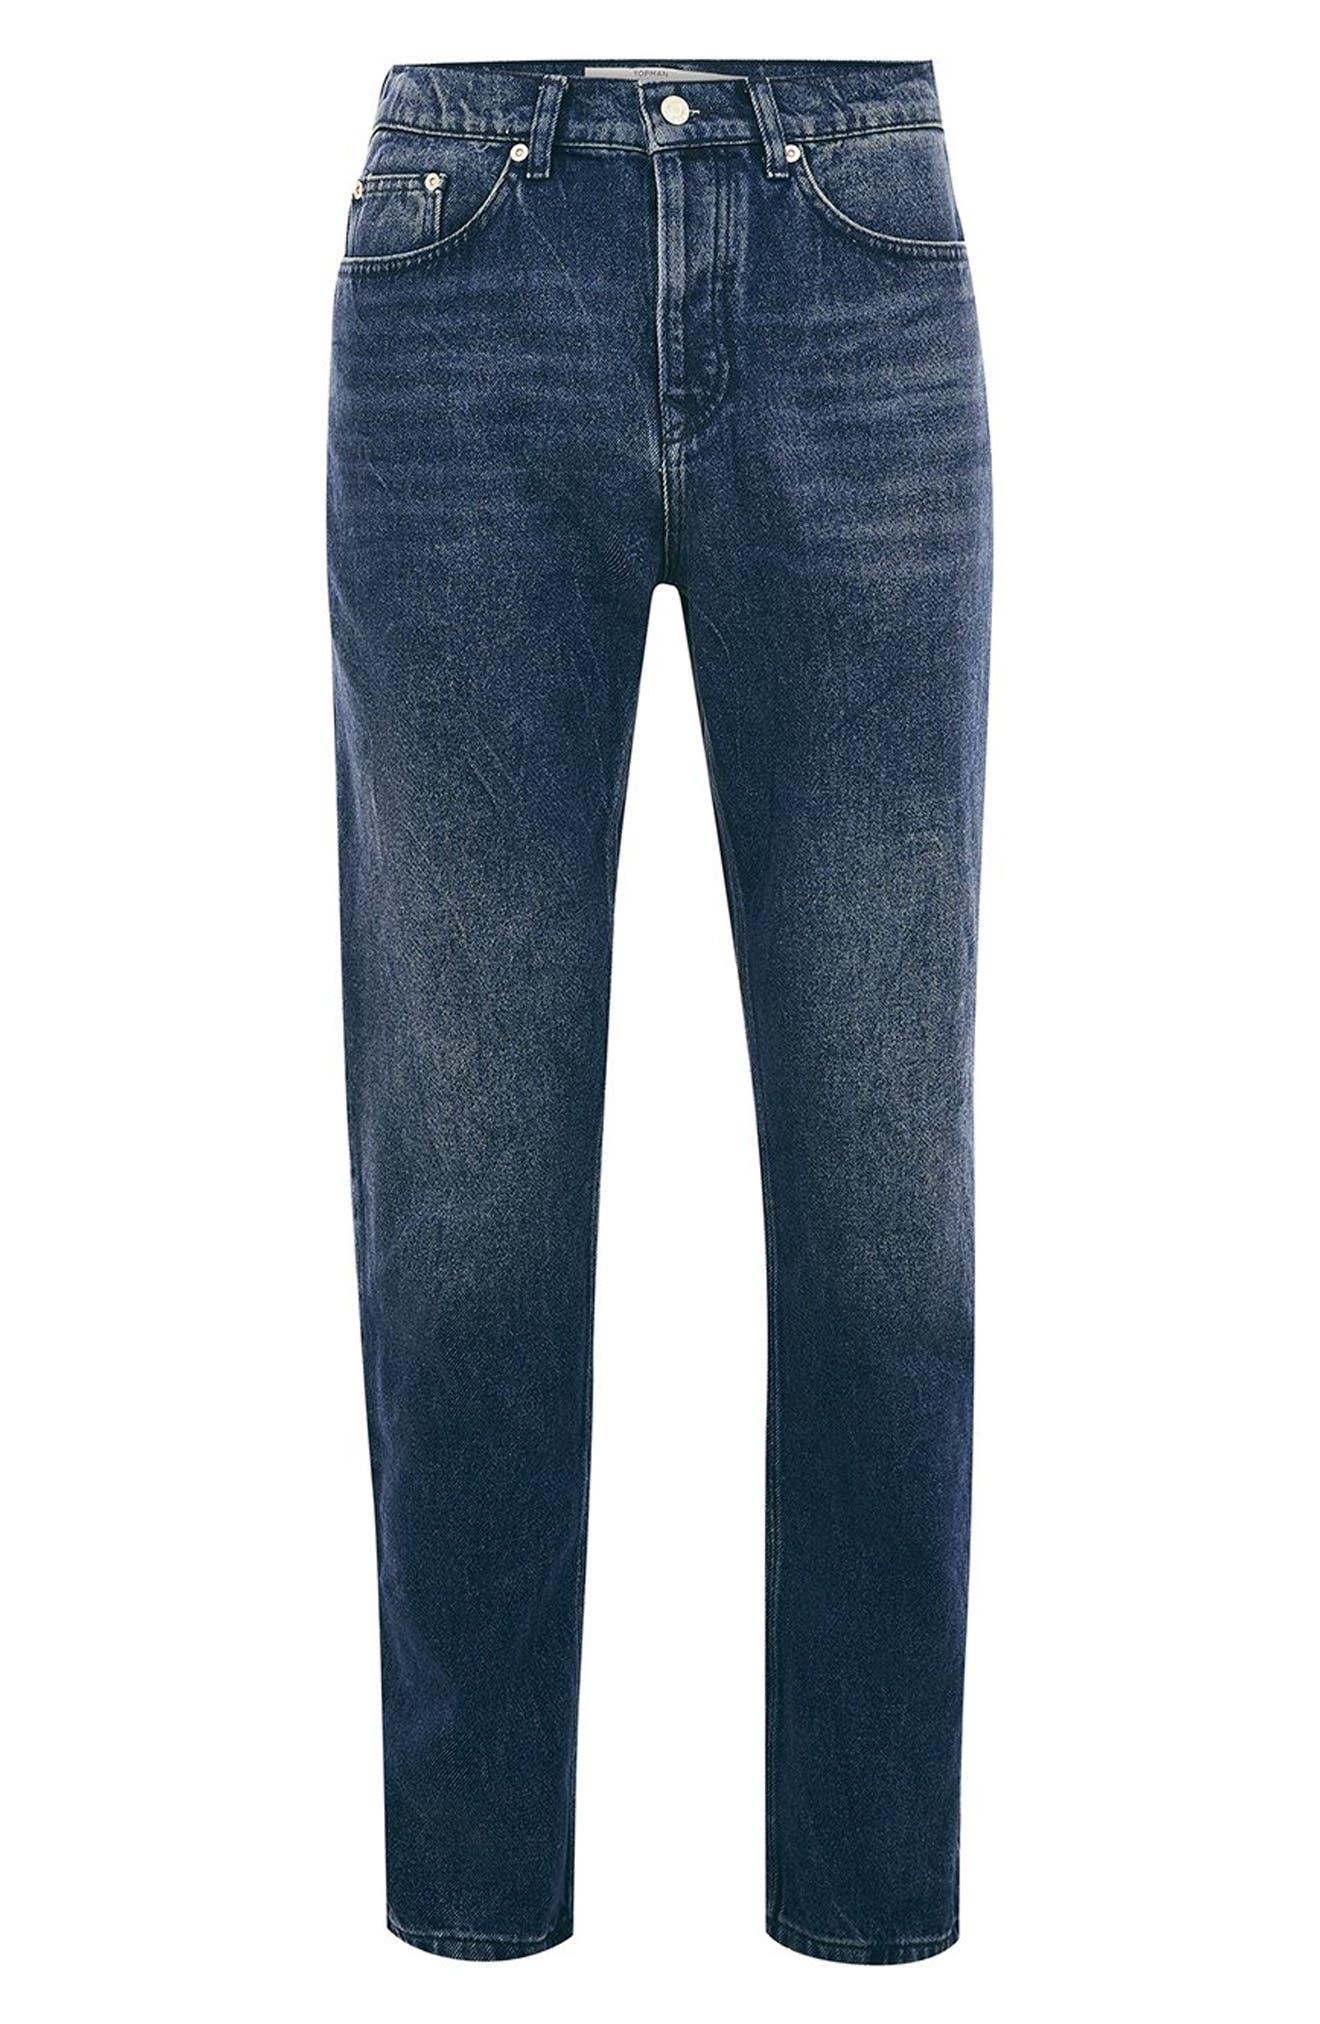 Cupid Rigid Taper Jeans,                             Alternate thumbnail 4, color,                             DARK BLUE